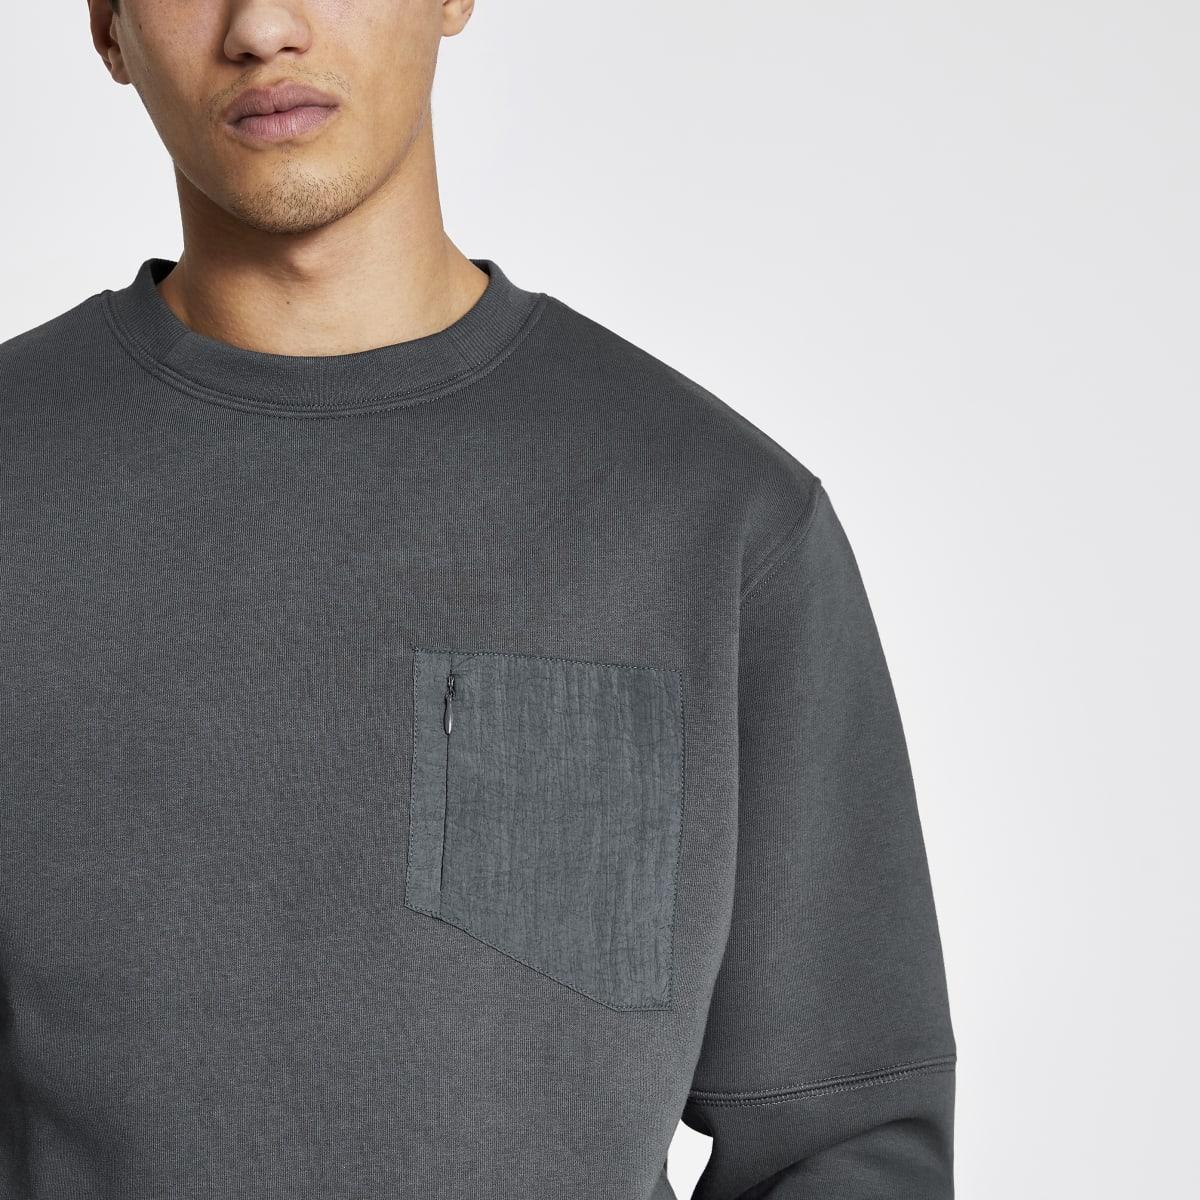 Pastel Tech - Grijze nylon sweater met zak